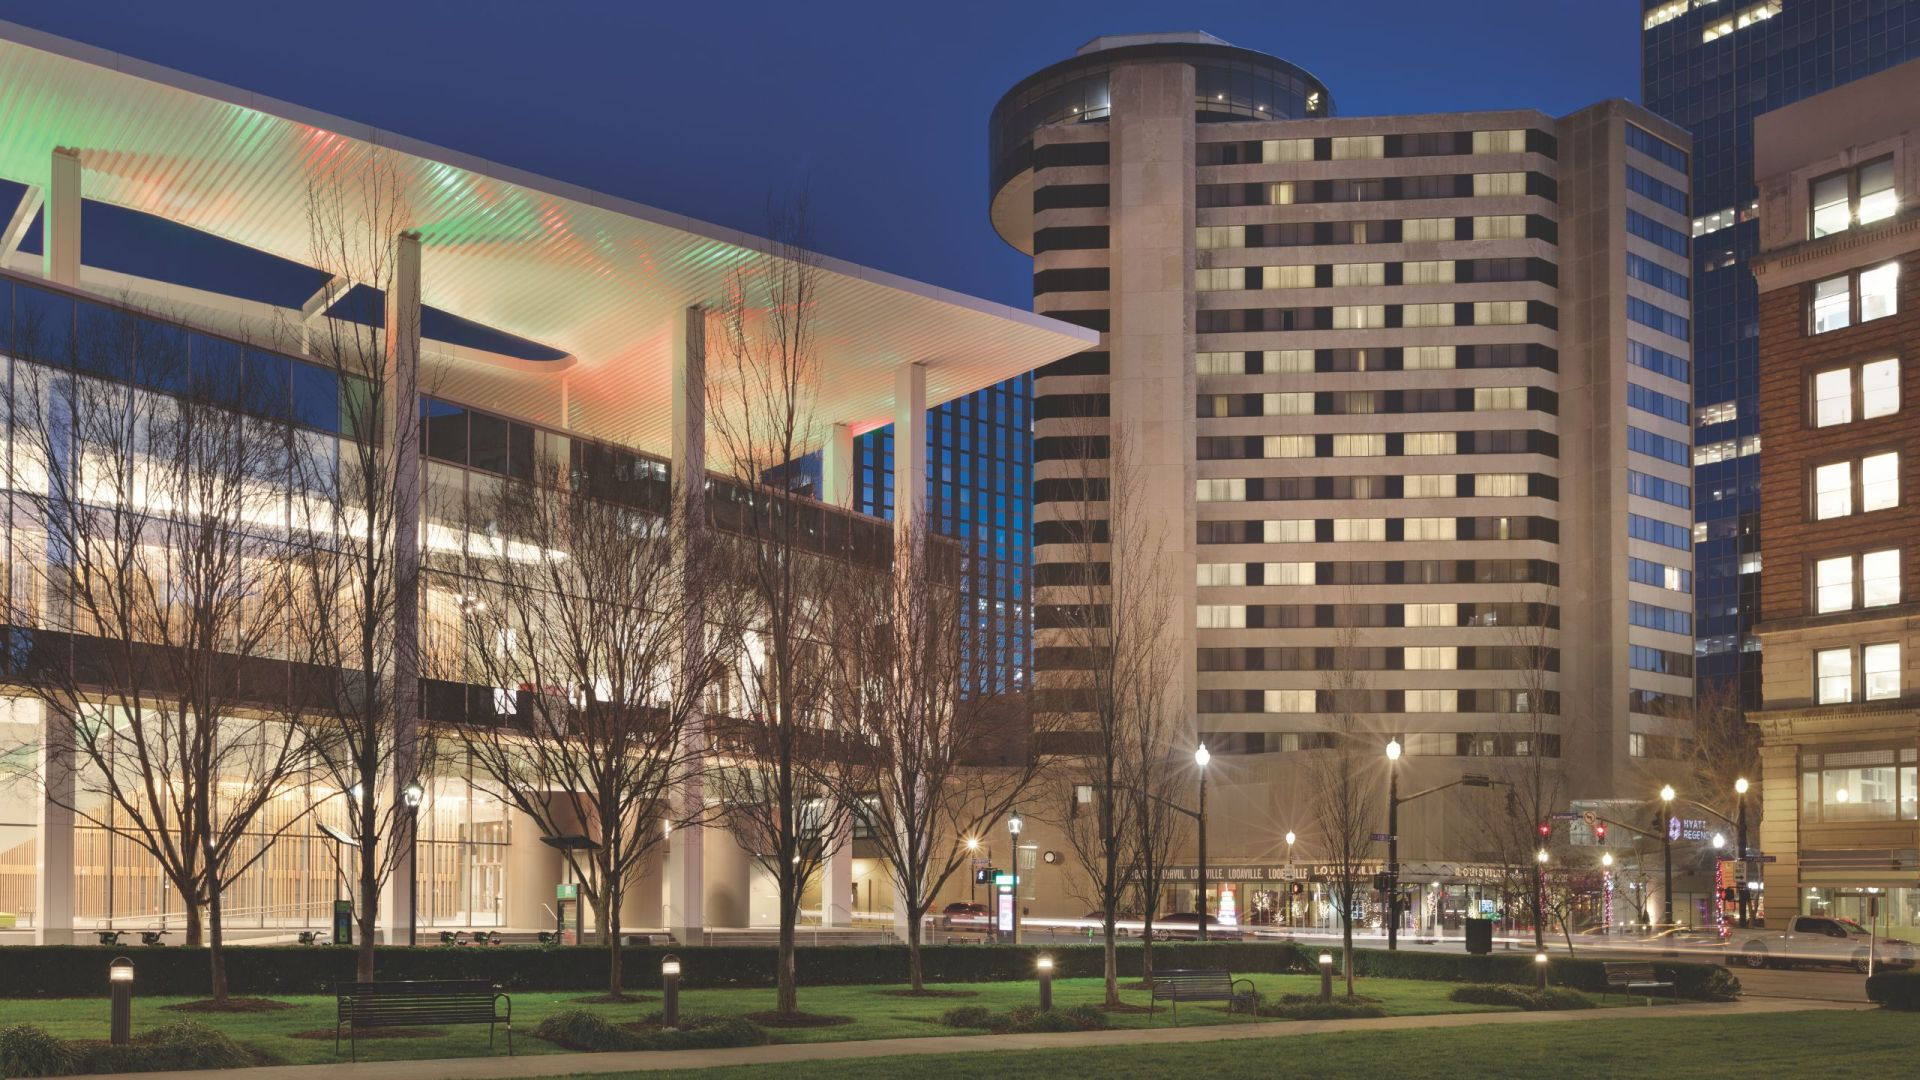 Convention Center Night